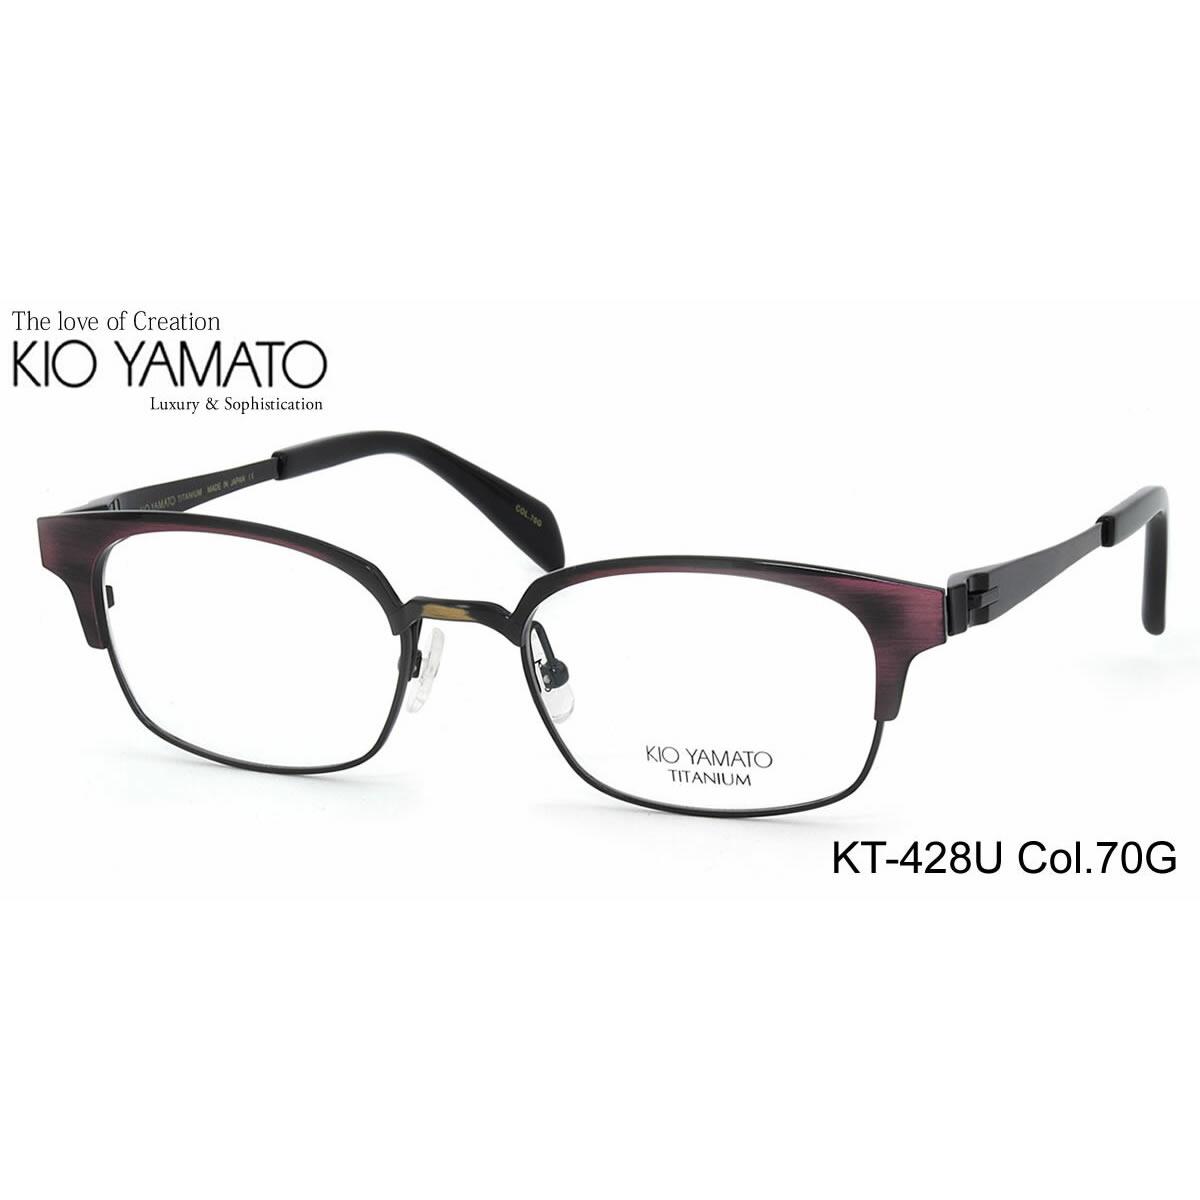 KIO YAMATO メガネ キオヤマト メガネフレーム KT428U 70G 52 あす楽対応